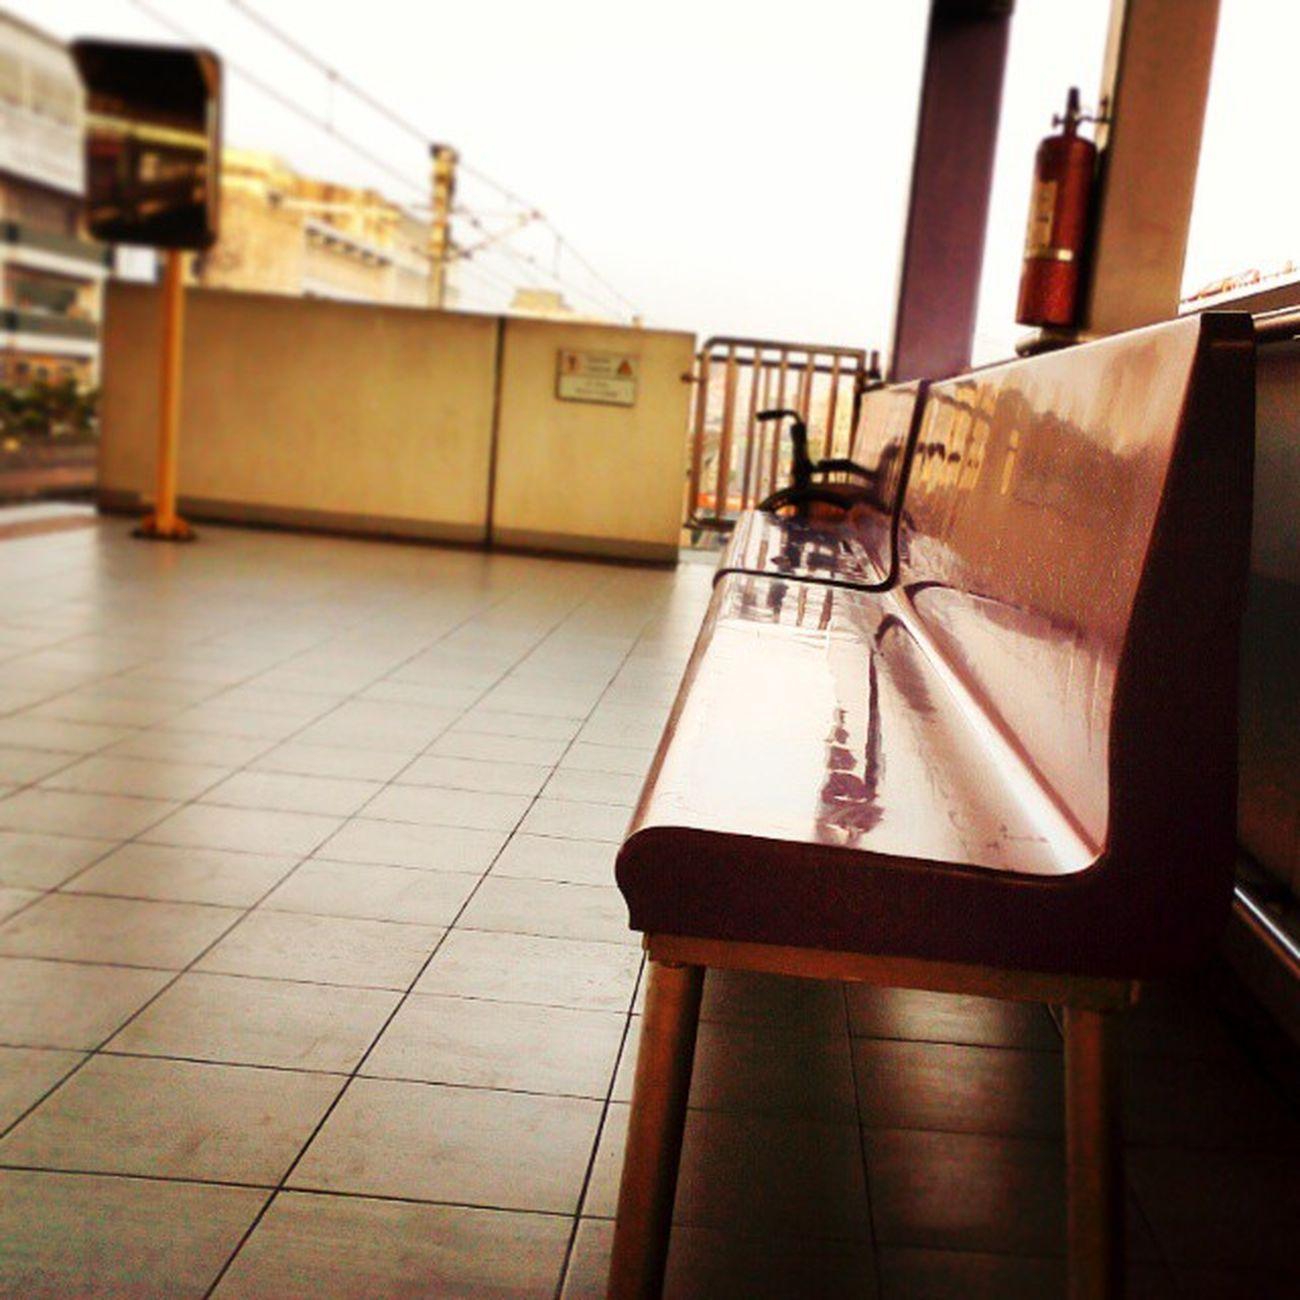 Lrt2 Pureza Station